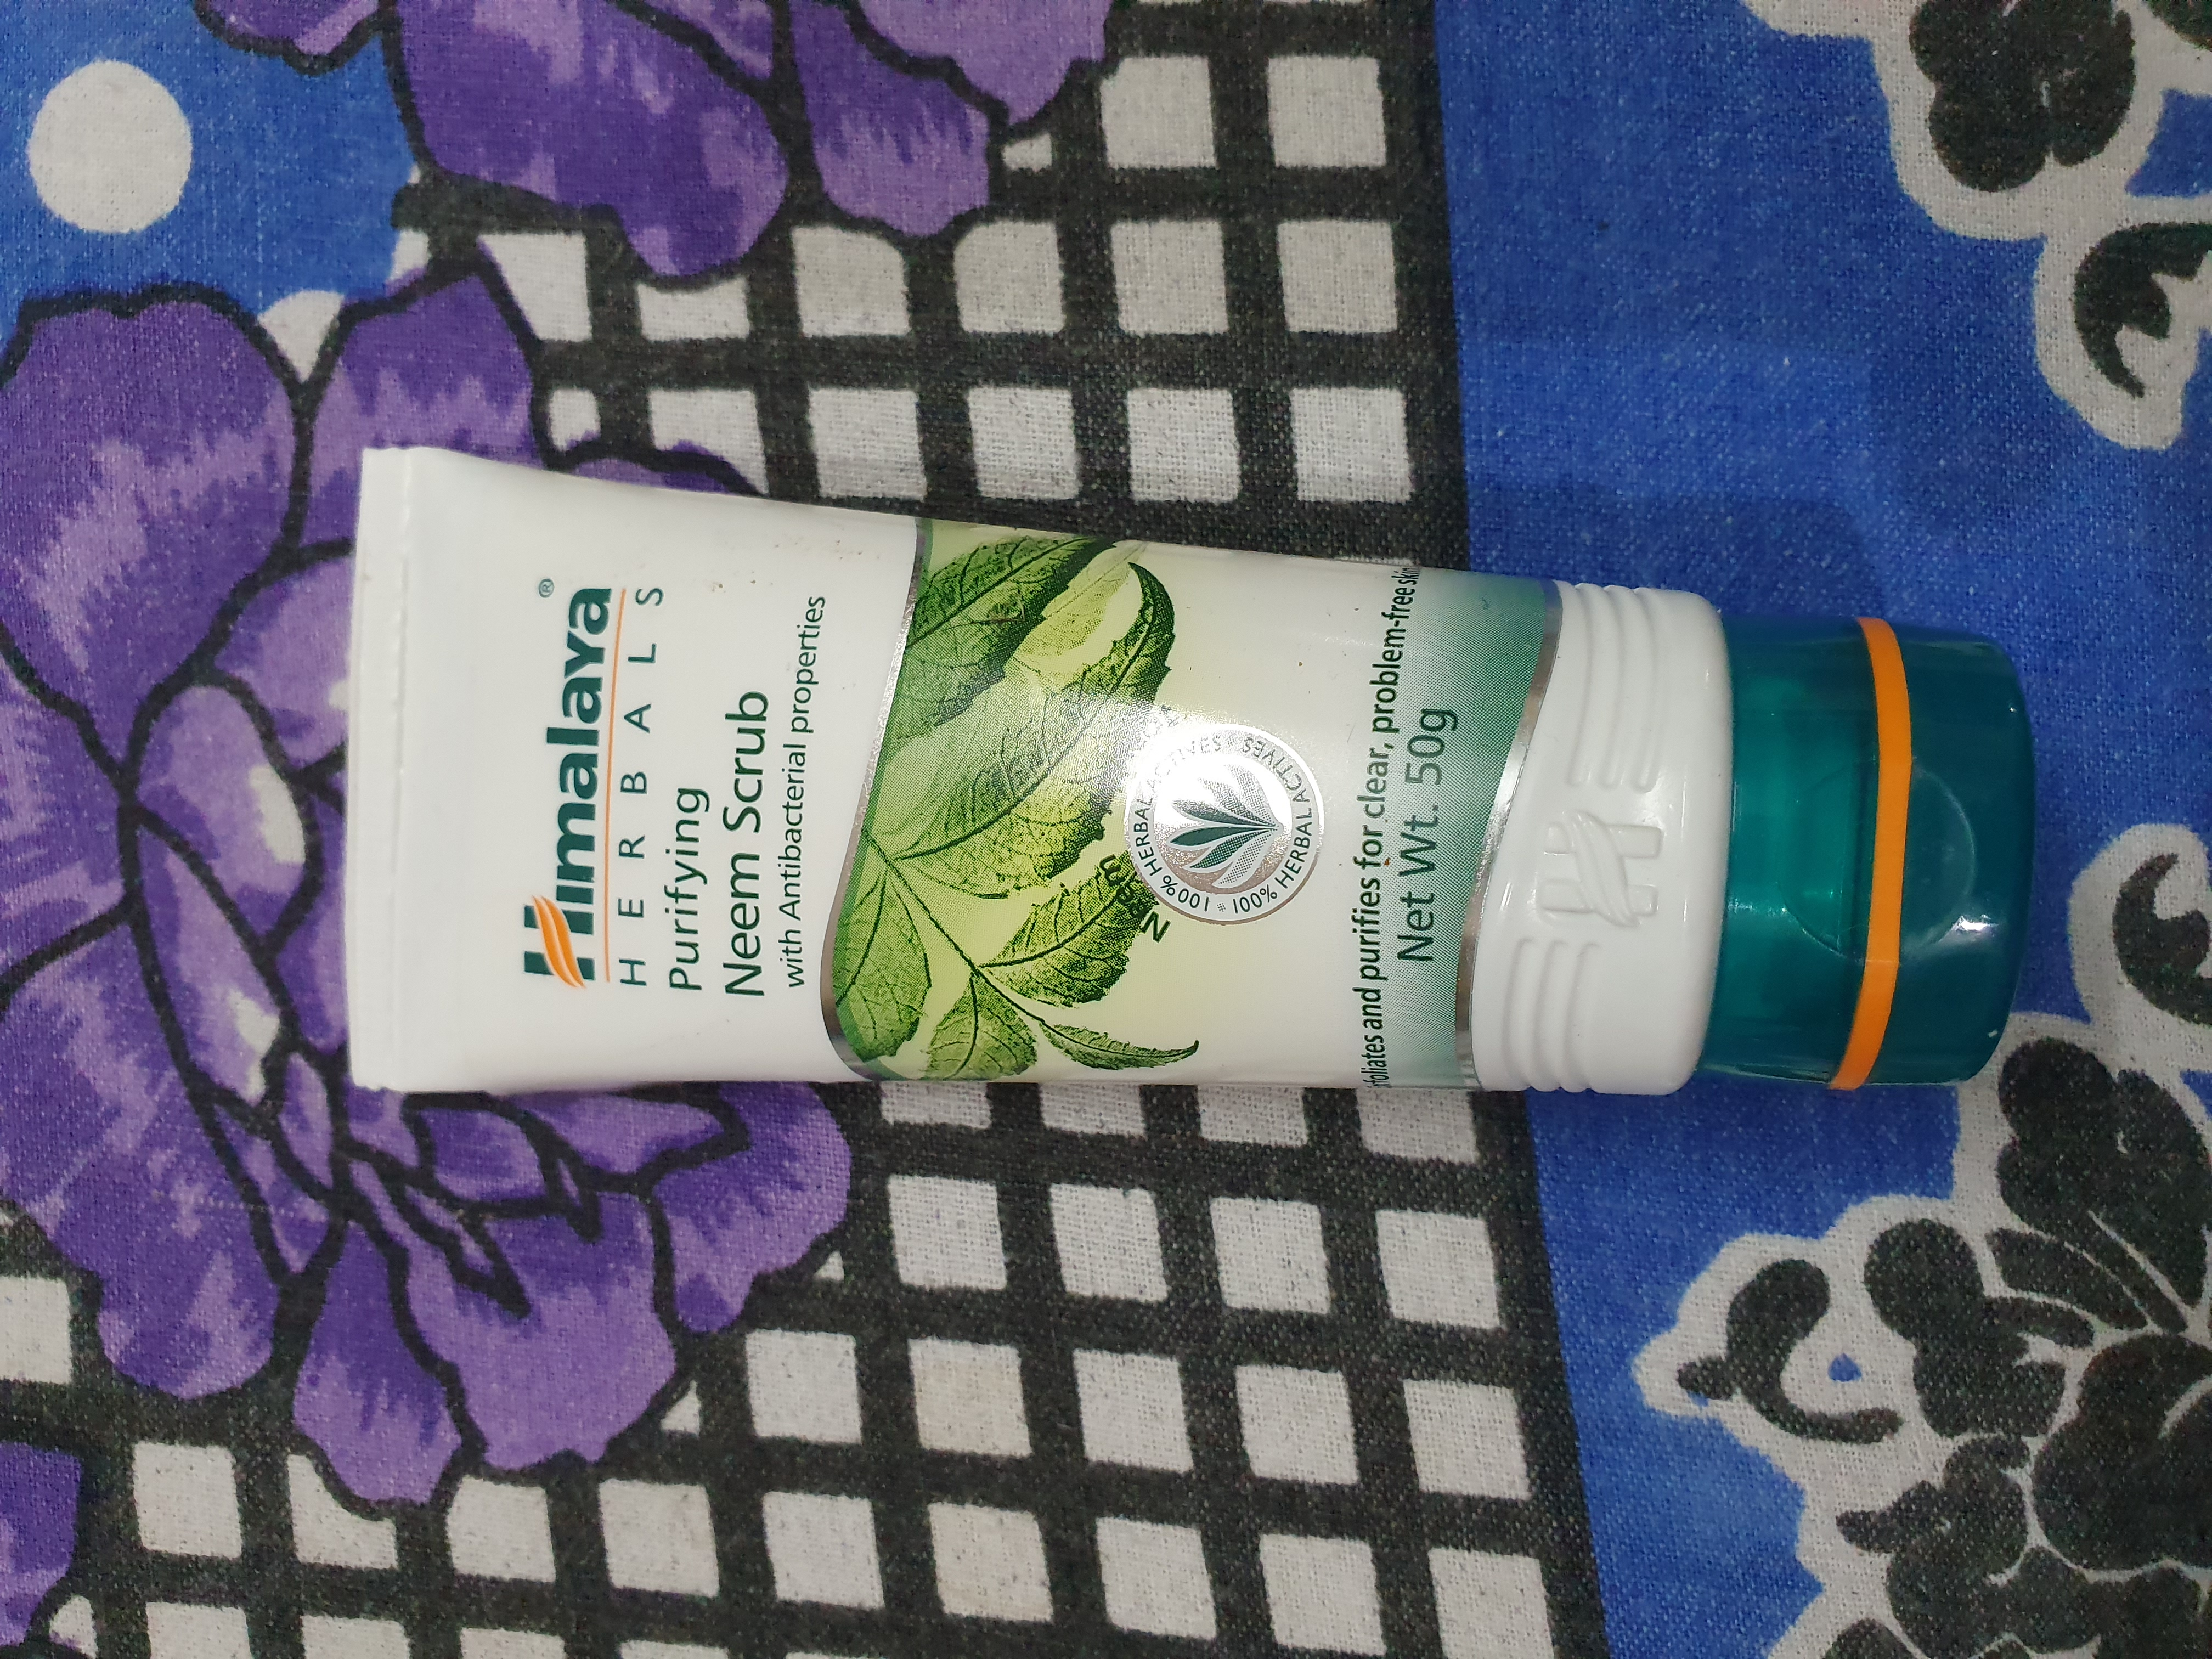 Himalaya Herbals Purifying Neem Scrub-Perfect blend of neem & apricot-By ankita_agarwal